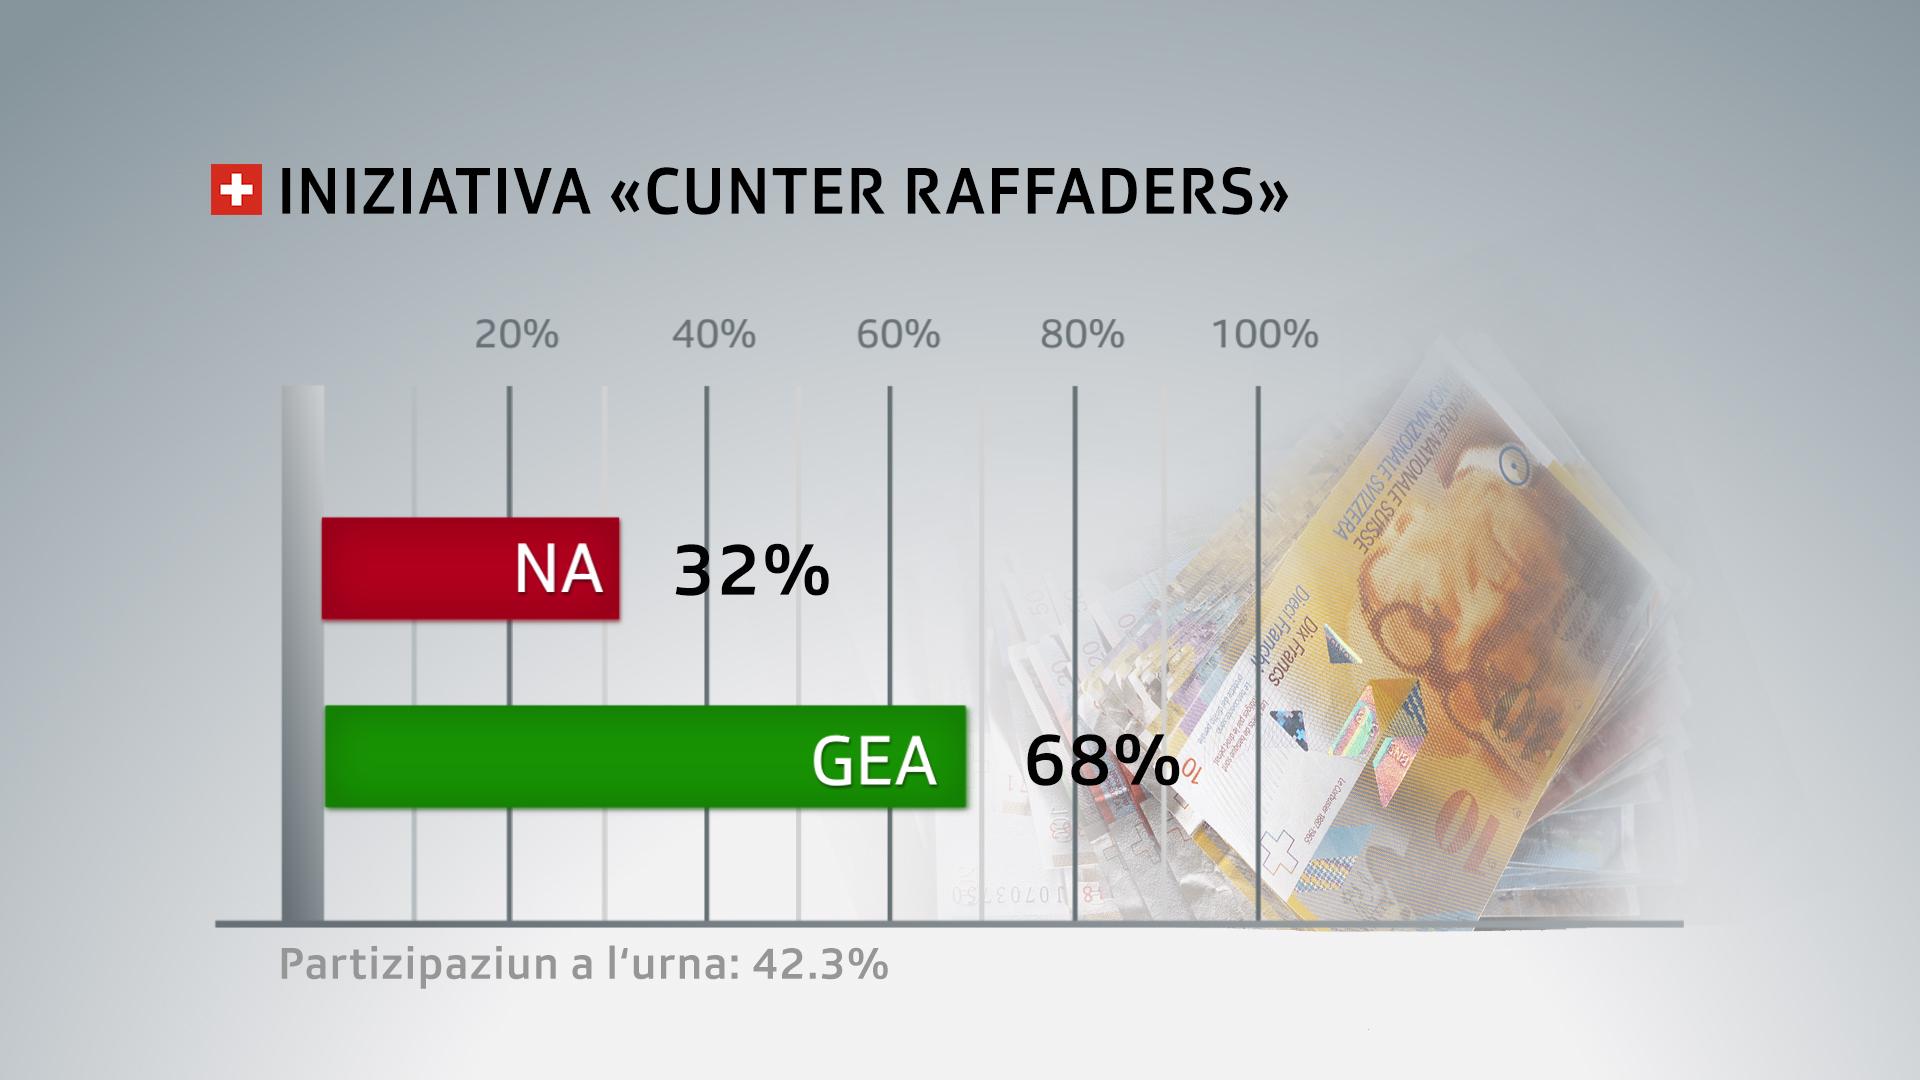 L'iniziativa cunter raffaders ha gì grond sustegn en Svizra.